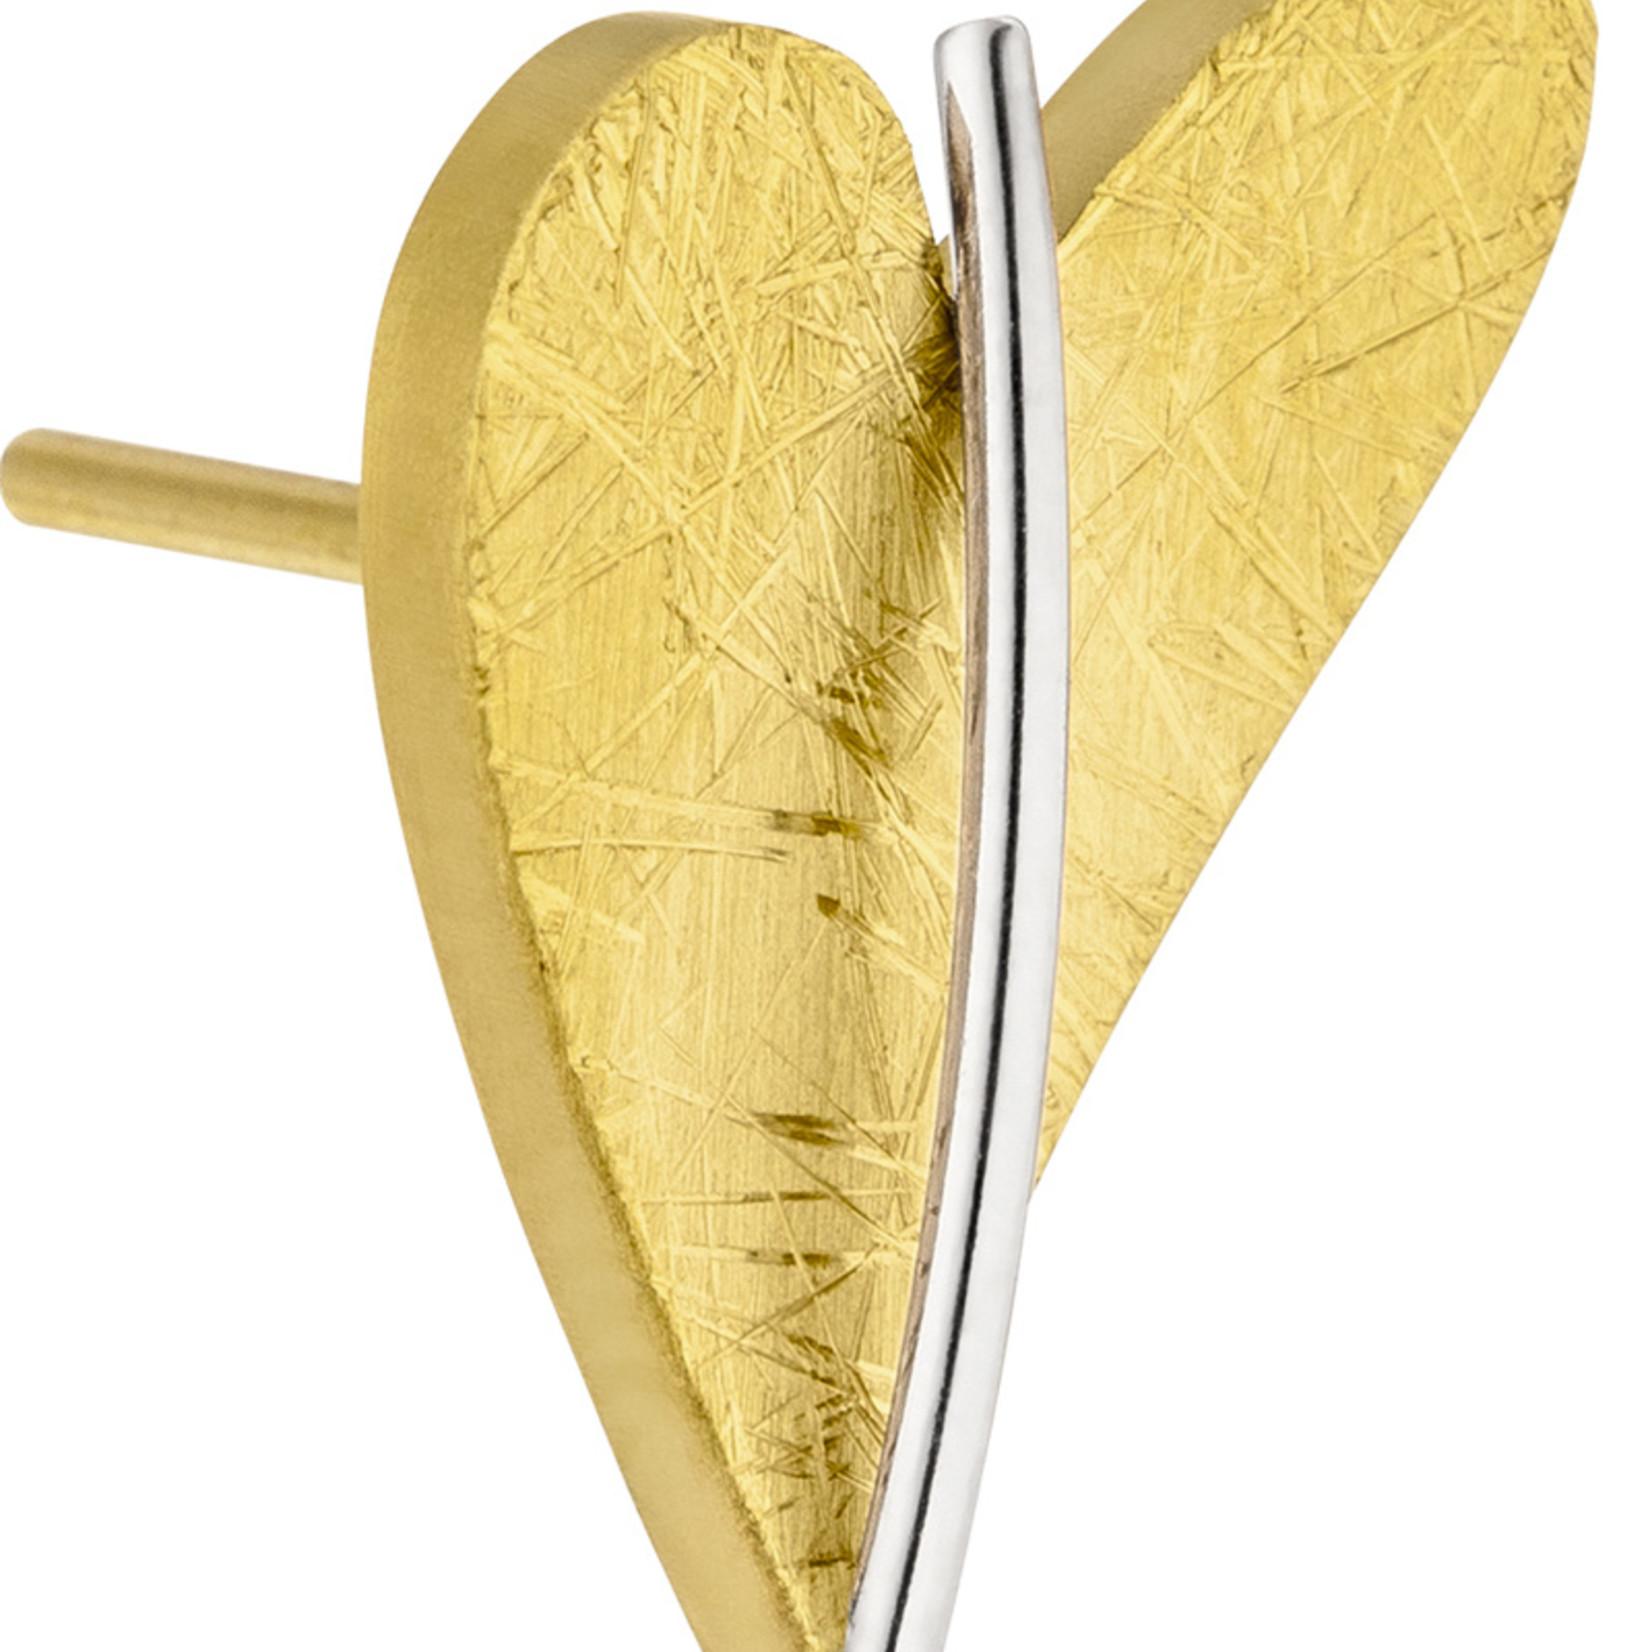 Ernstes Design Stahlschmuck Ohrstecker E245 Herz I Ernstes Design I Edelstahl gelbgold